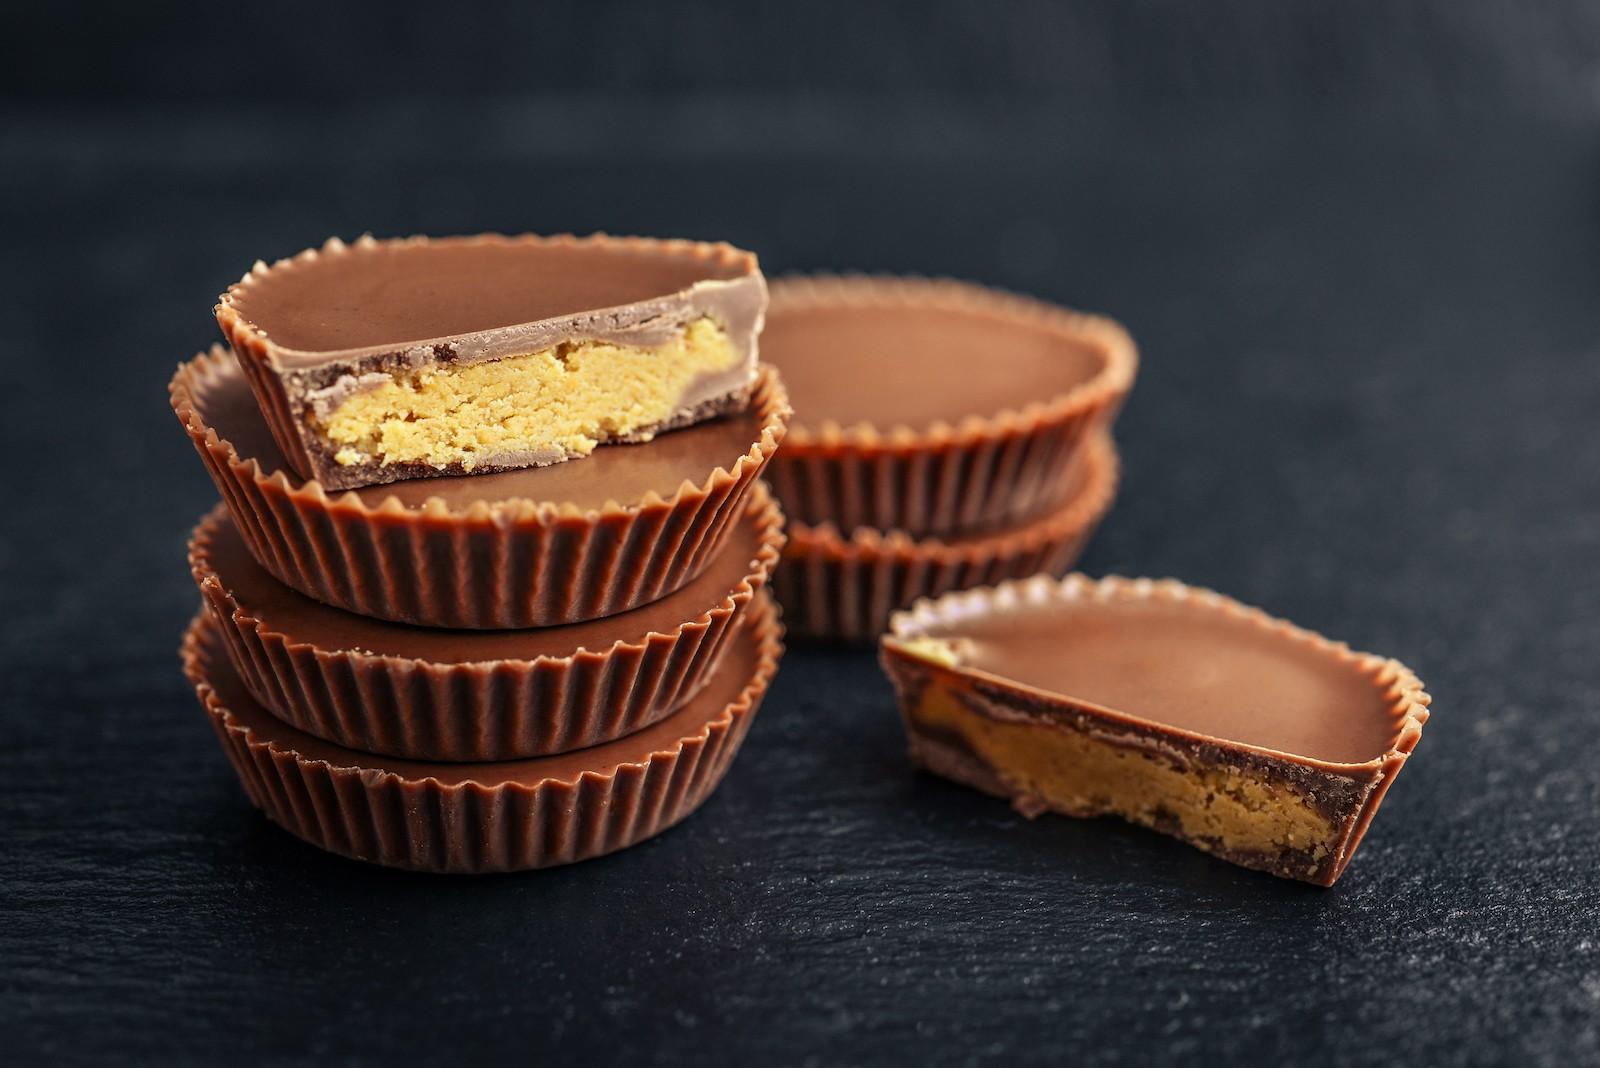 Dunkin' Peanut Butter Cup Swirl Review